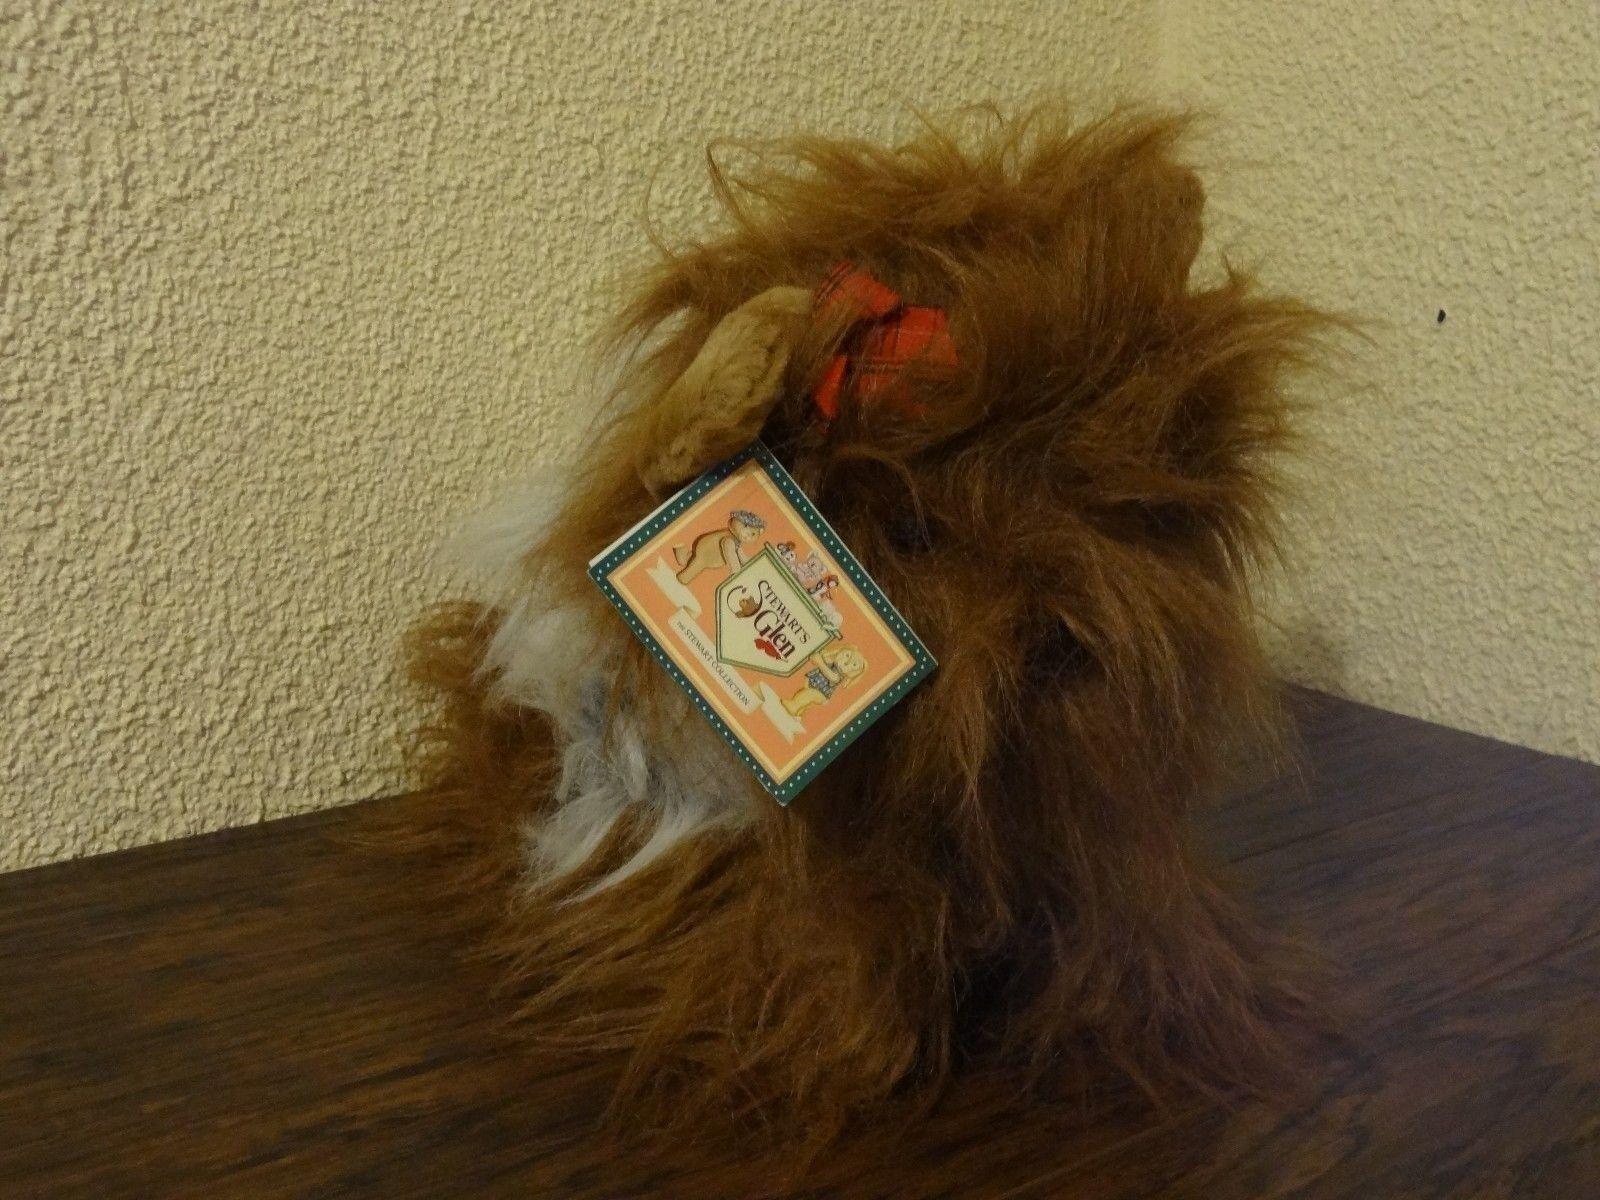 Stewart Glen Yorkshire Terrier Maltese Shih Tzu Dog Puppy Stuffed Plush Animal